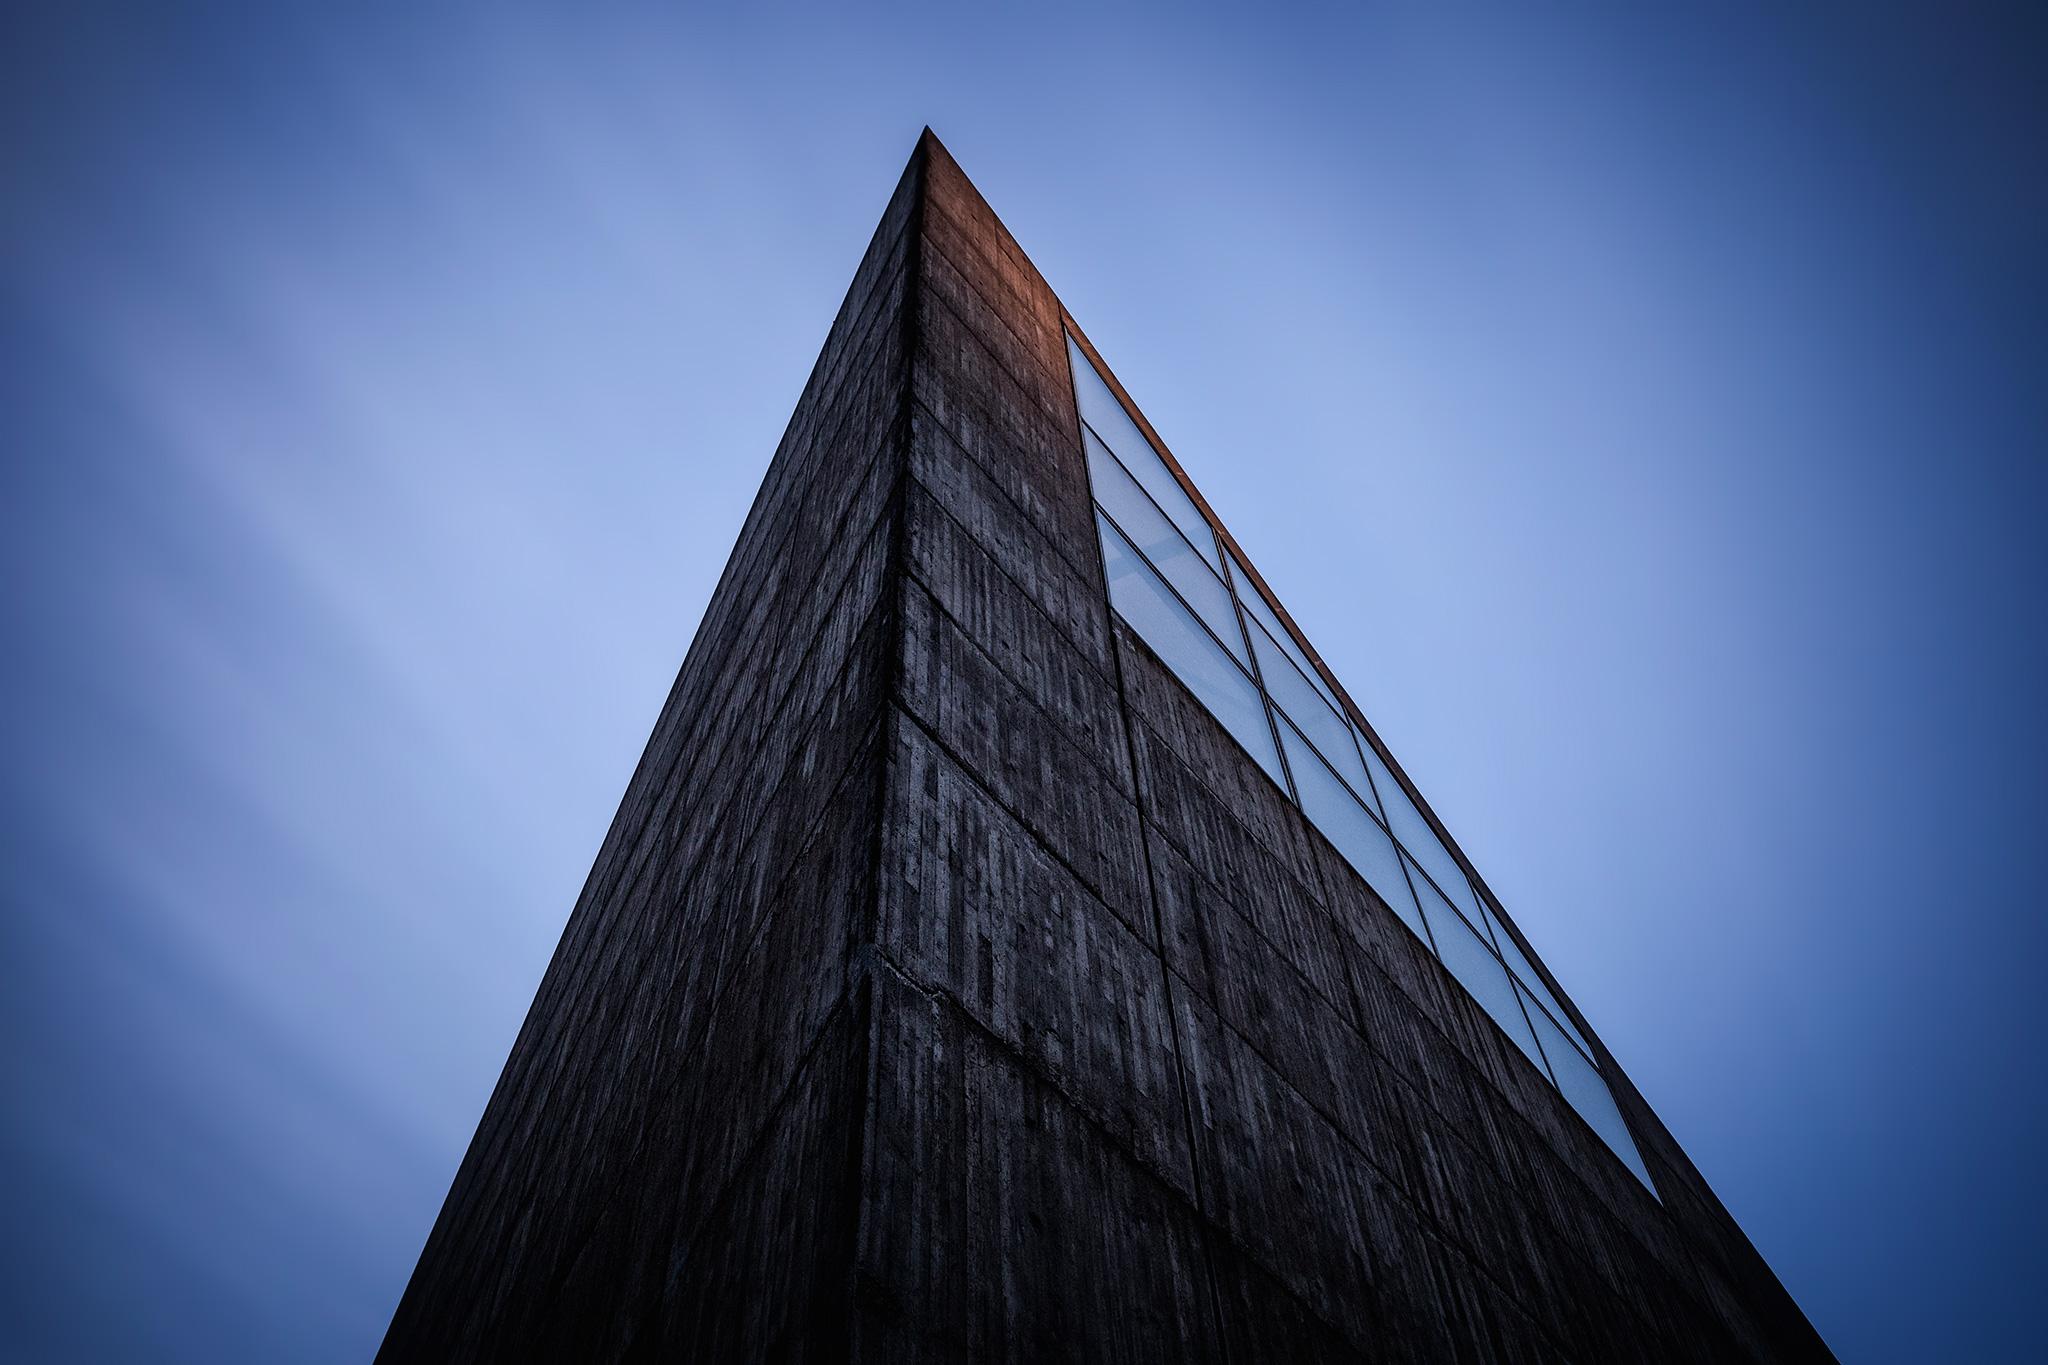 4 Minutes of Concrete - Roparnäs kyrka